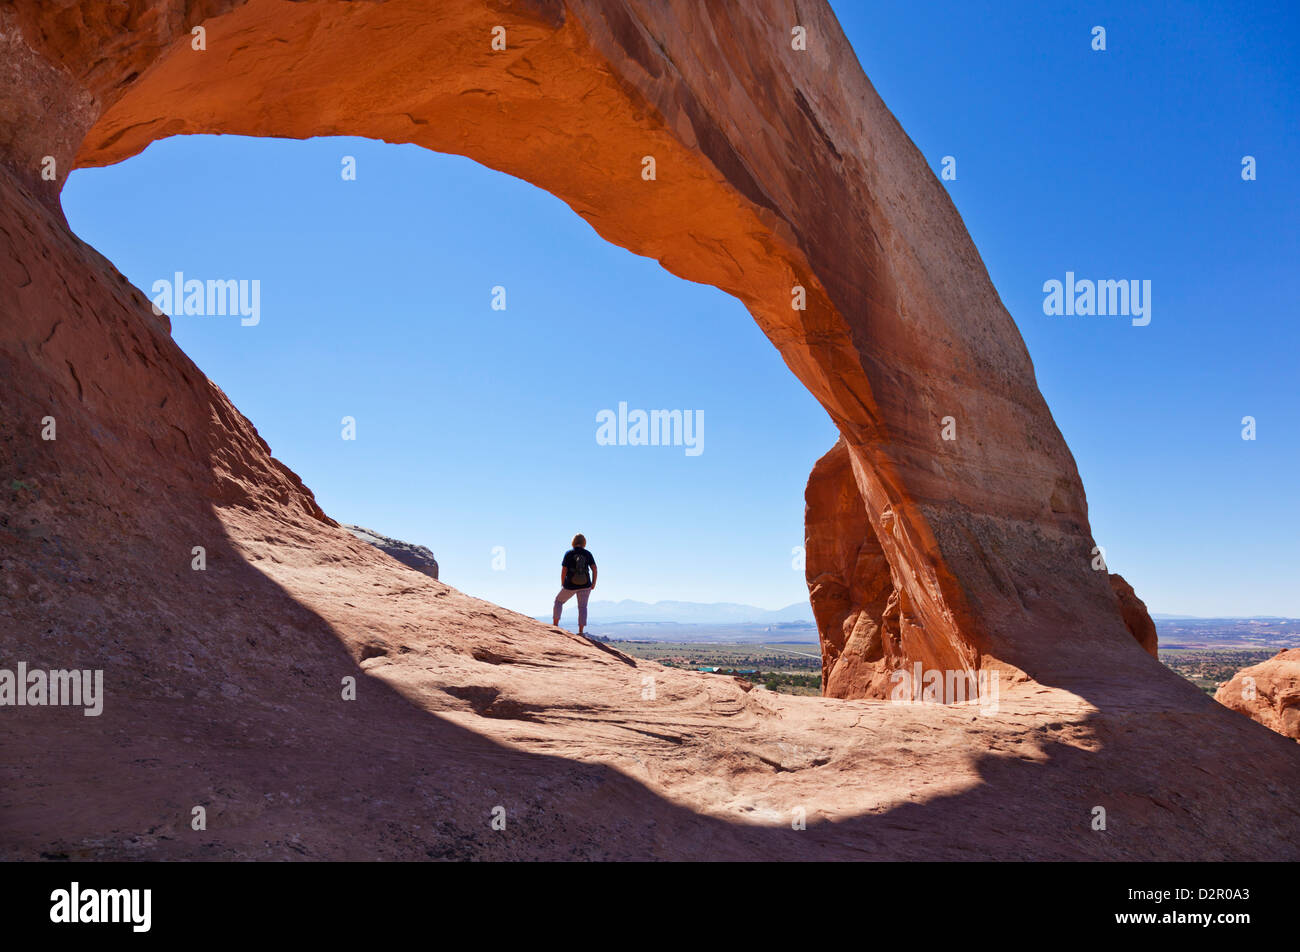 Turista solitario caminante en Wilson Arch, cerca de Moab, Utah, Estados Unidos de América, América del Imagen De Stock